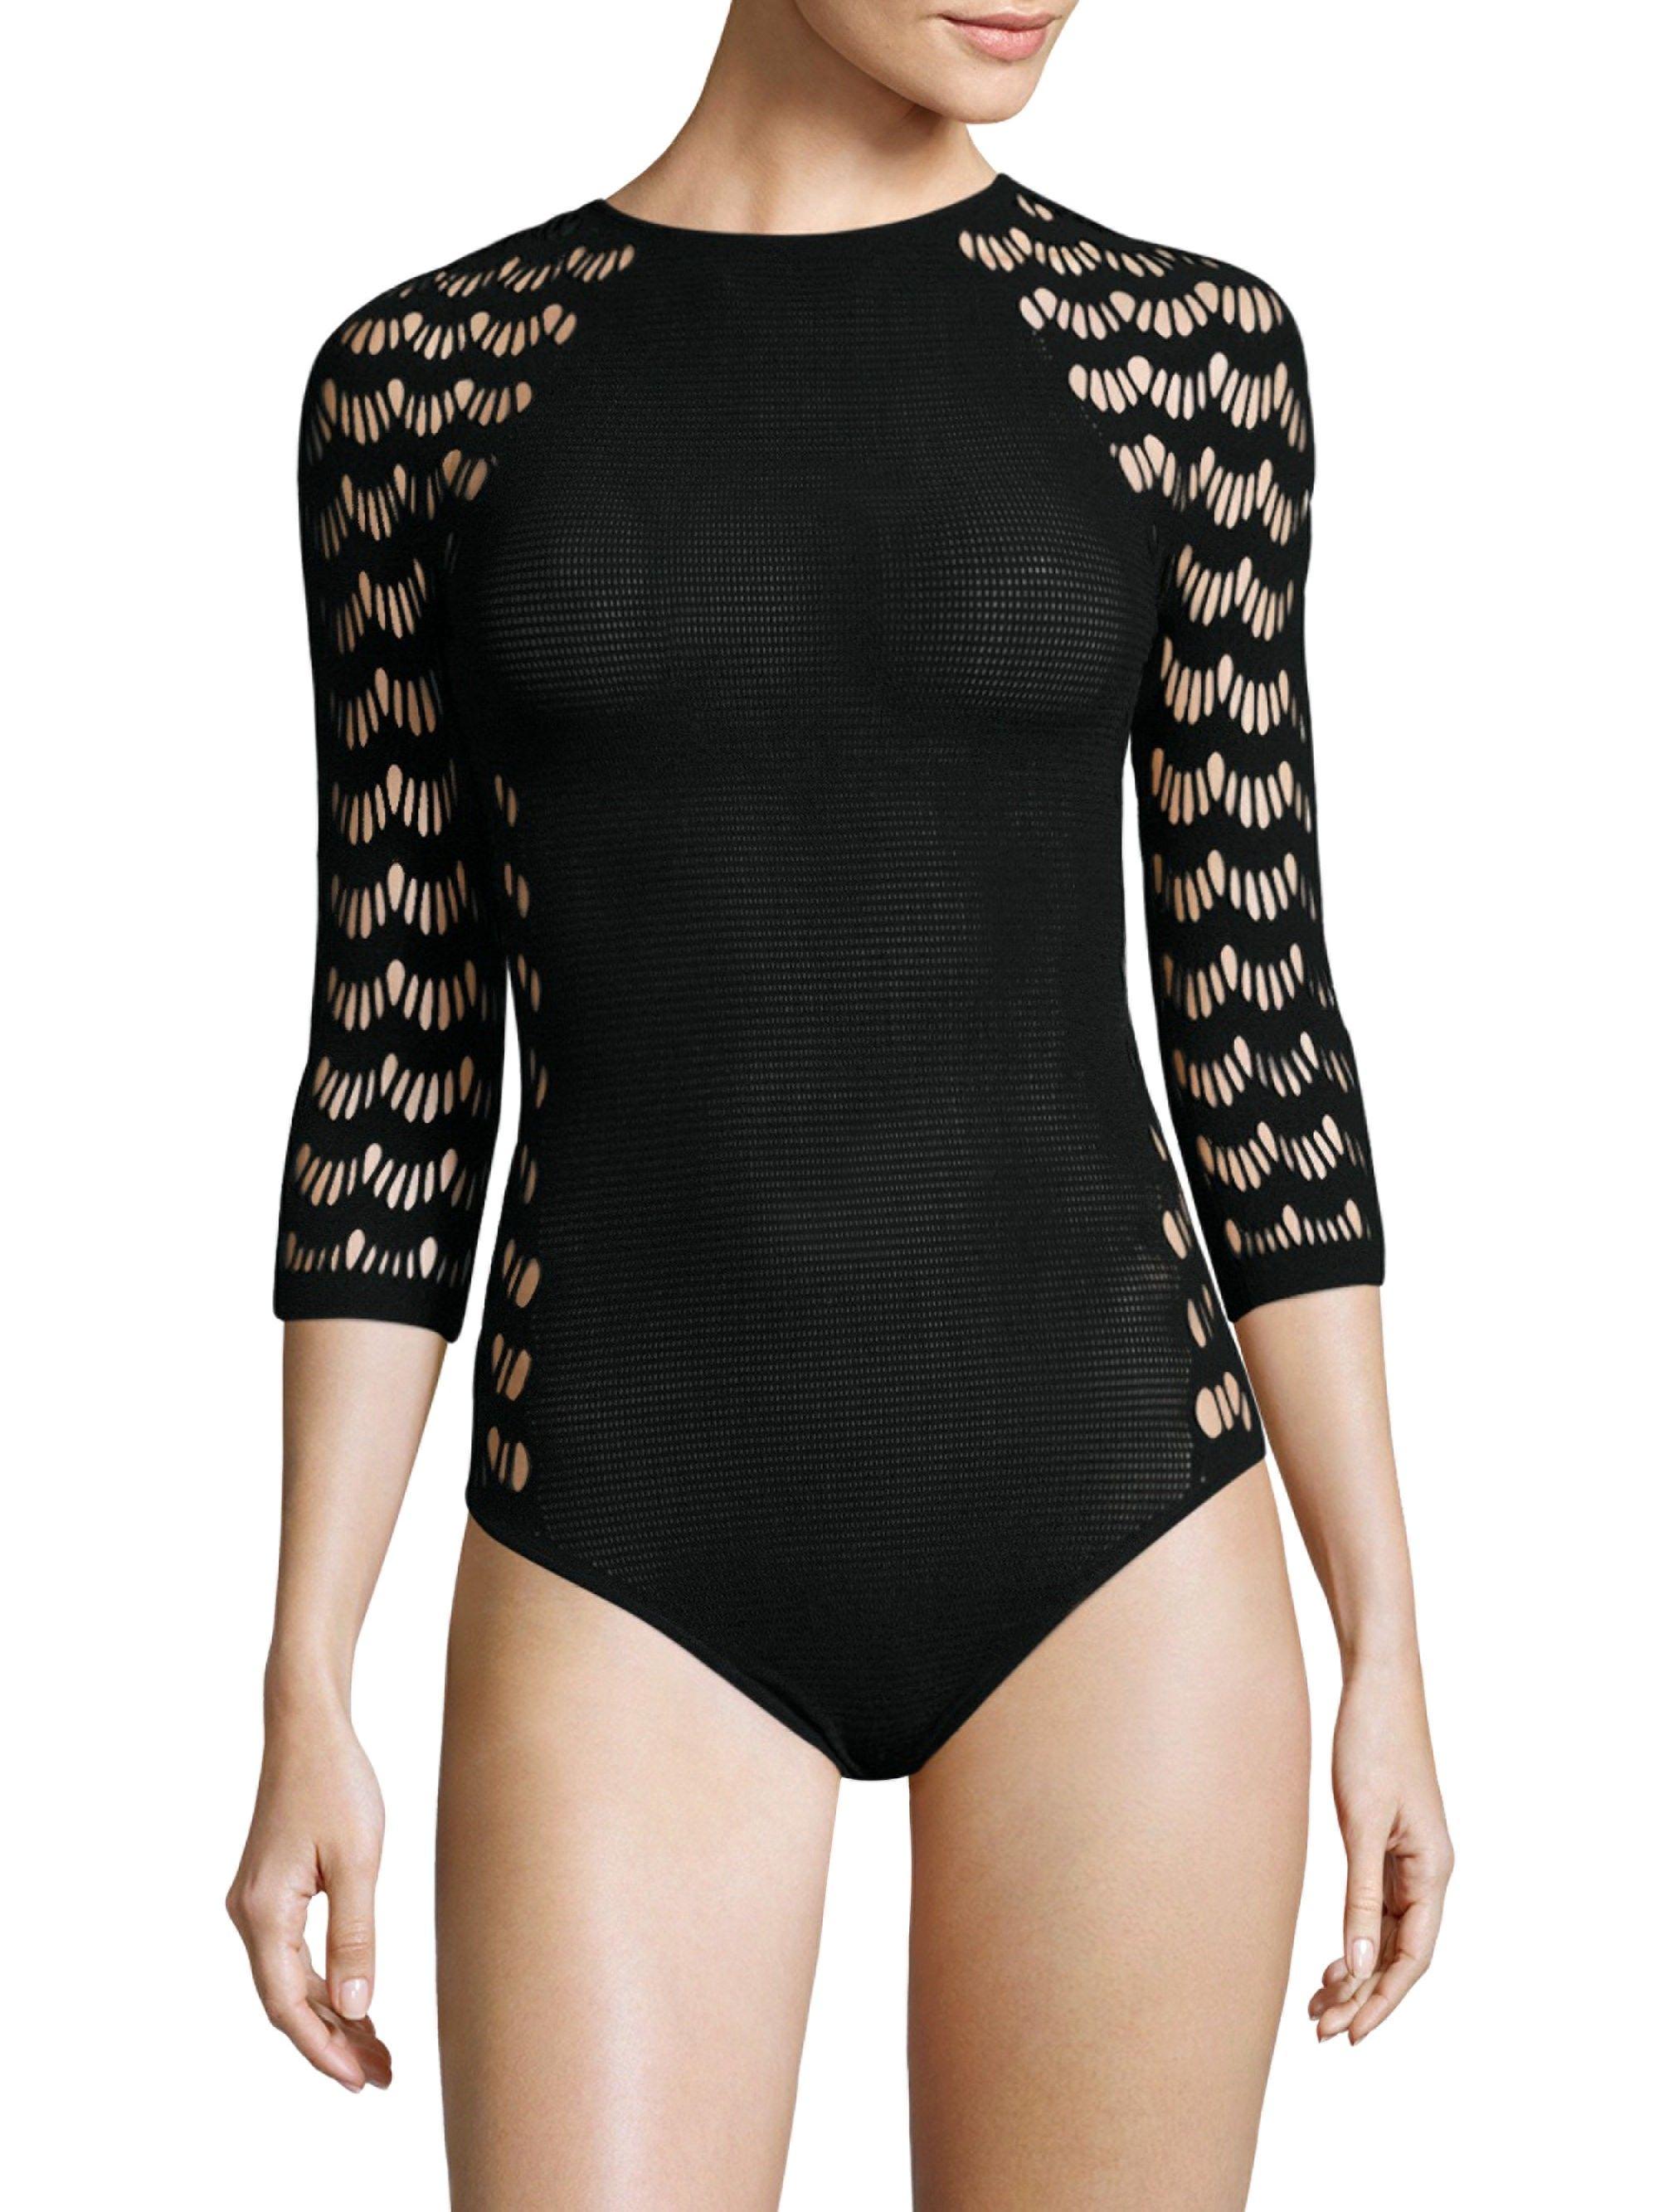 8d9d1445064c1 Wolford Mesh String Bodysuit - Black X-Small